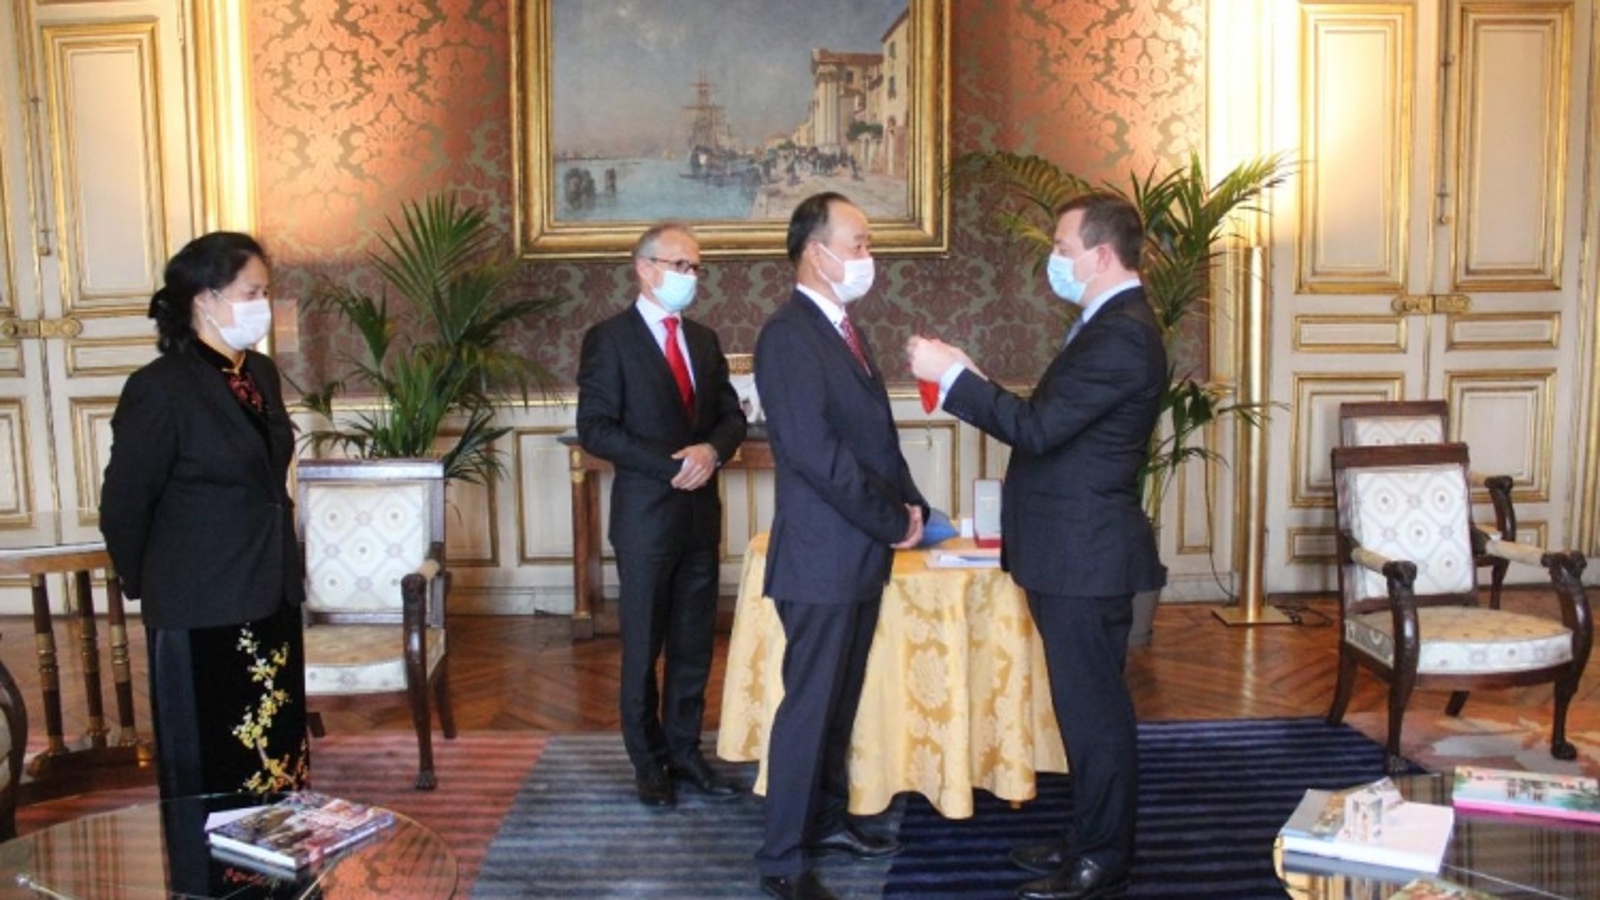 Vietnamese diplomat in Paris receives French honour